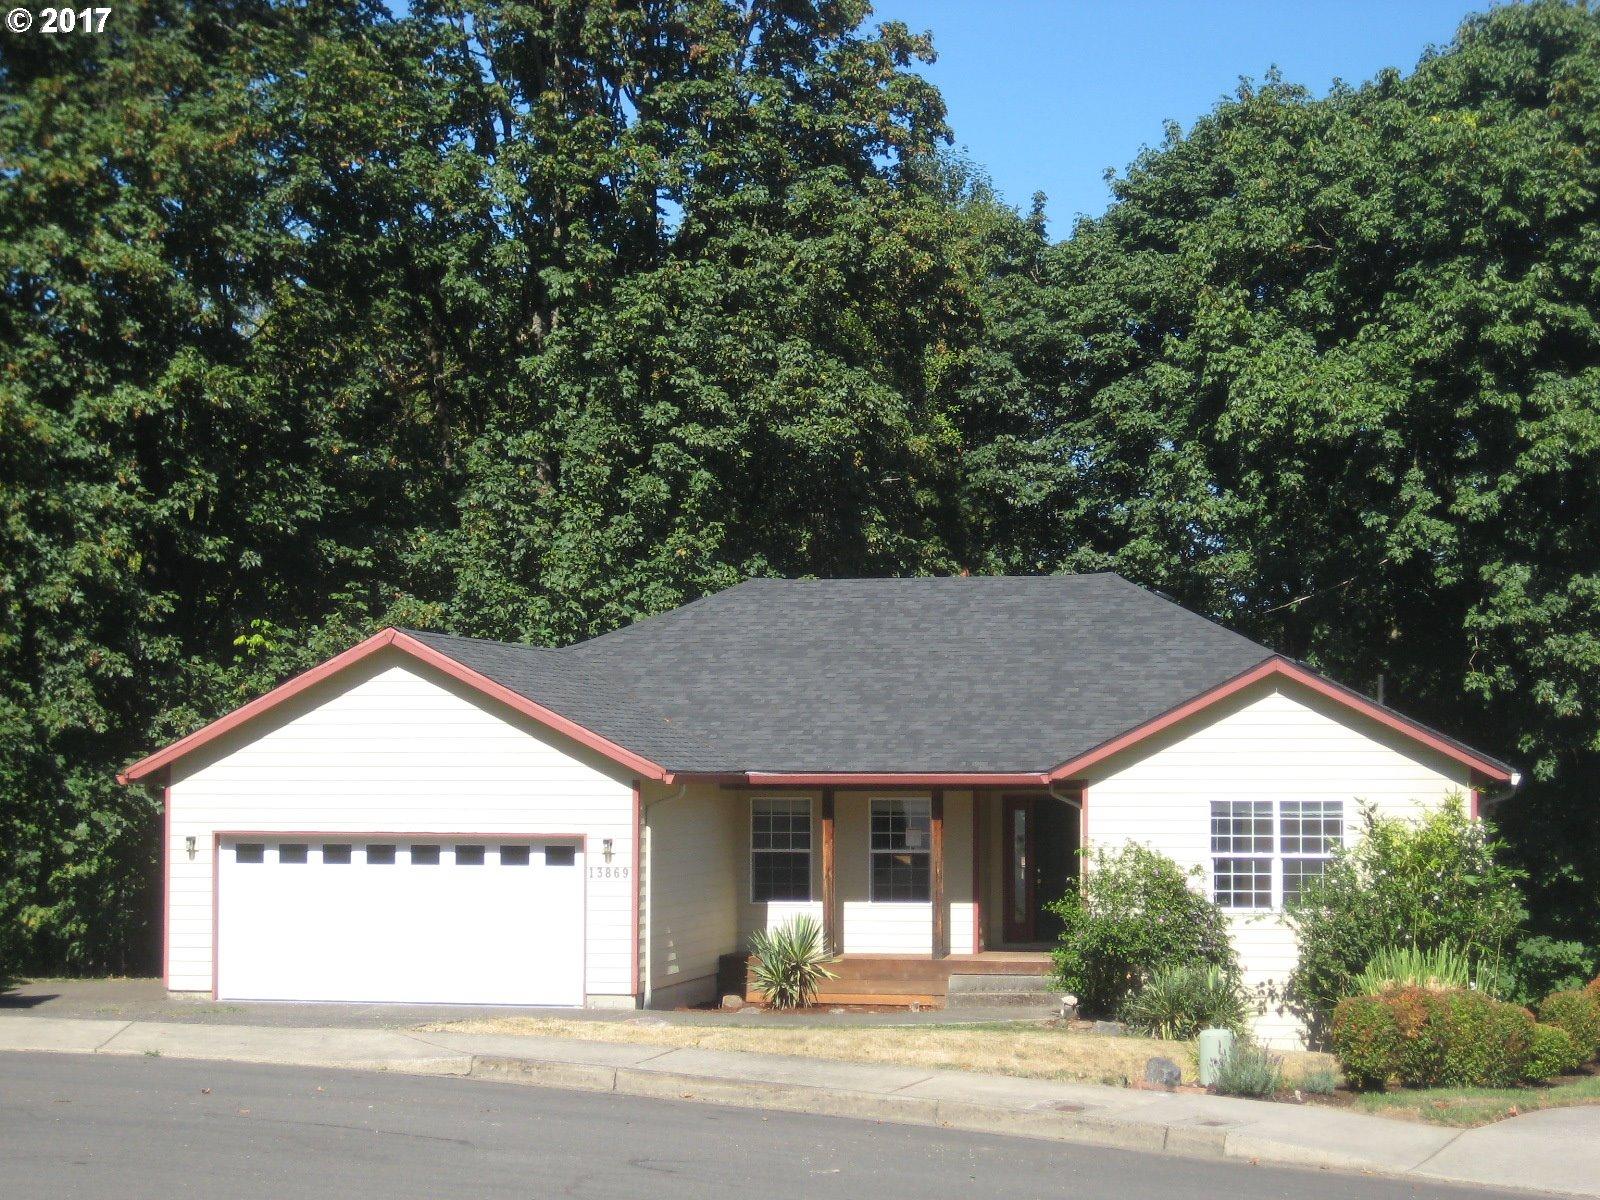 13869 BEAN CT, Oregon City, OR 97045